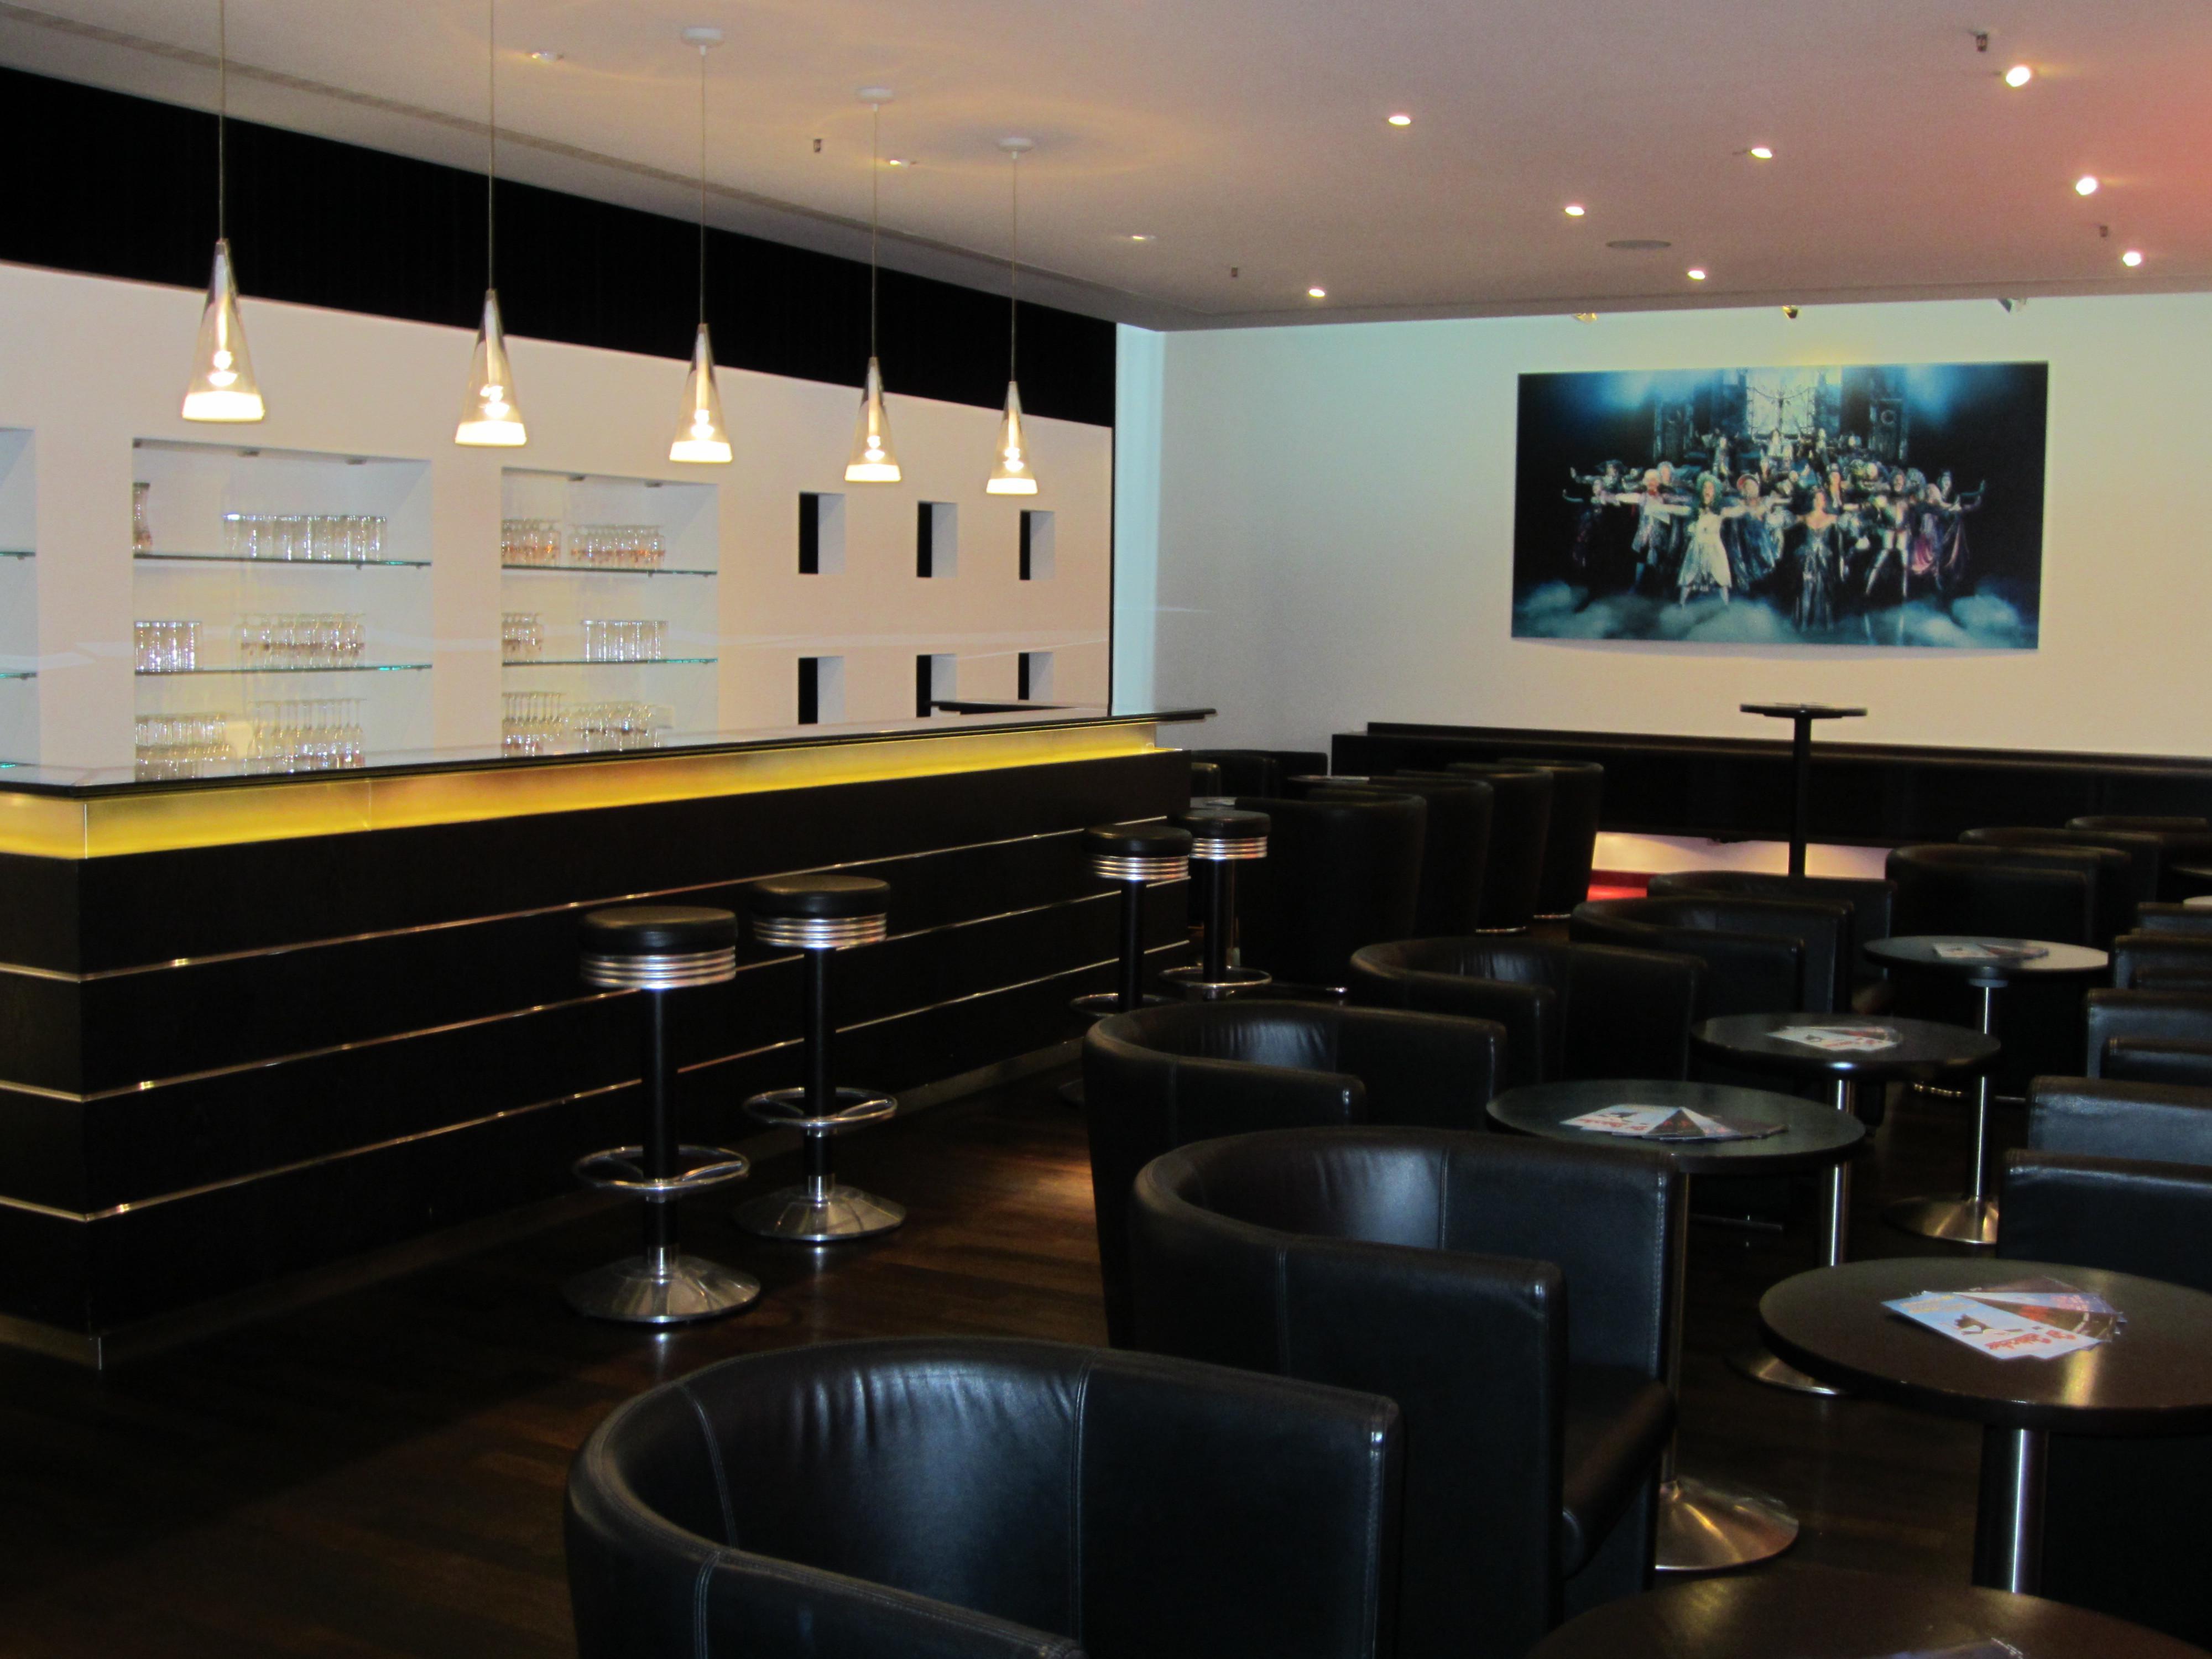 Filderstadt PR & Marketing Event  Club Lounge rechts image 1